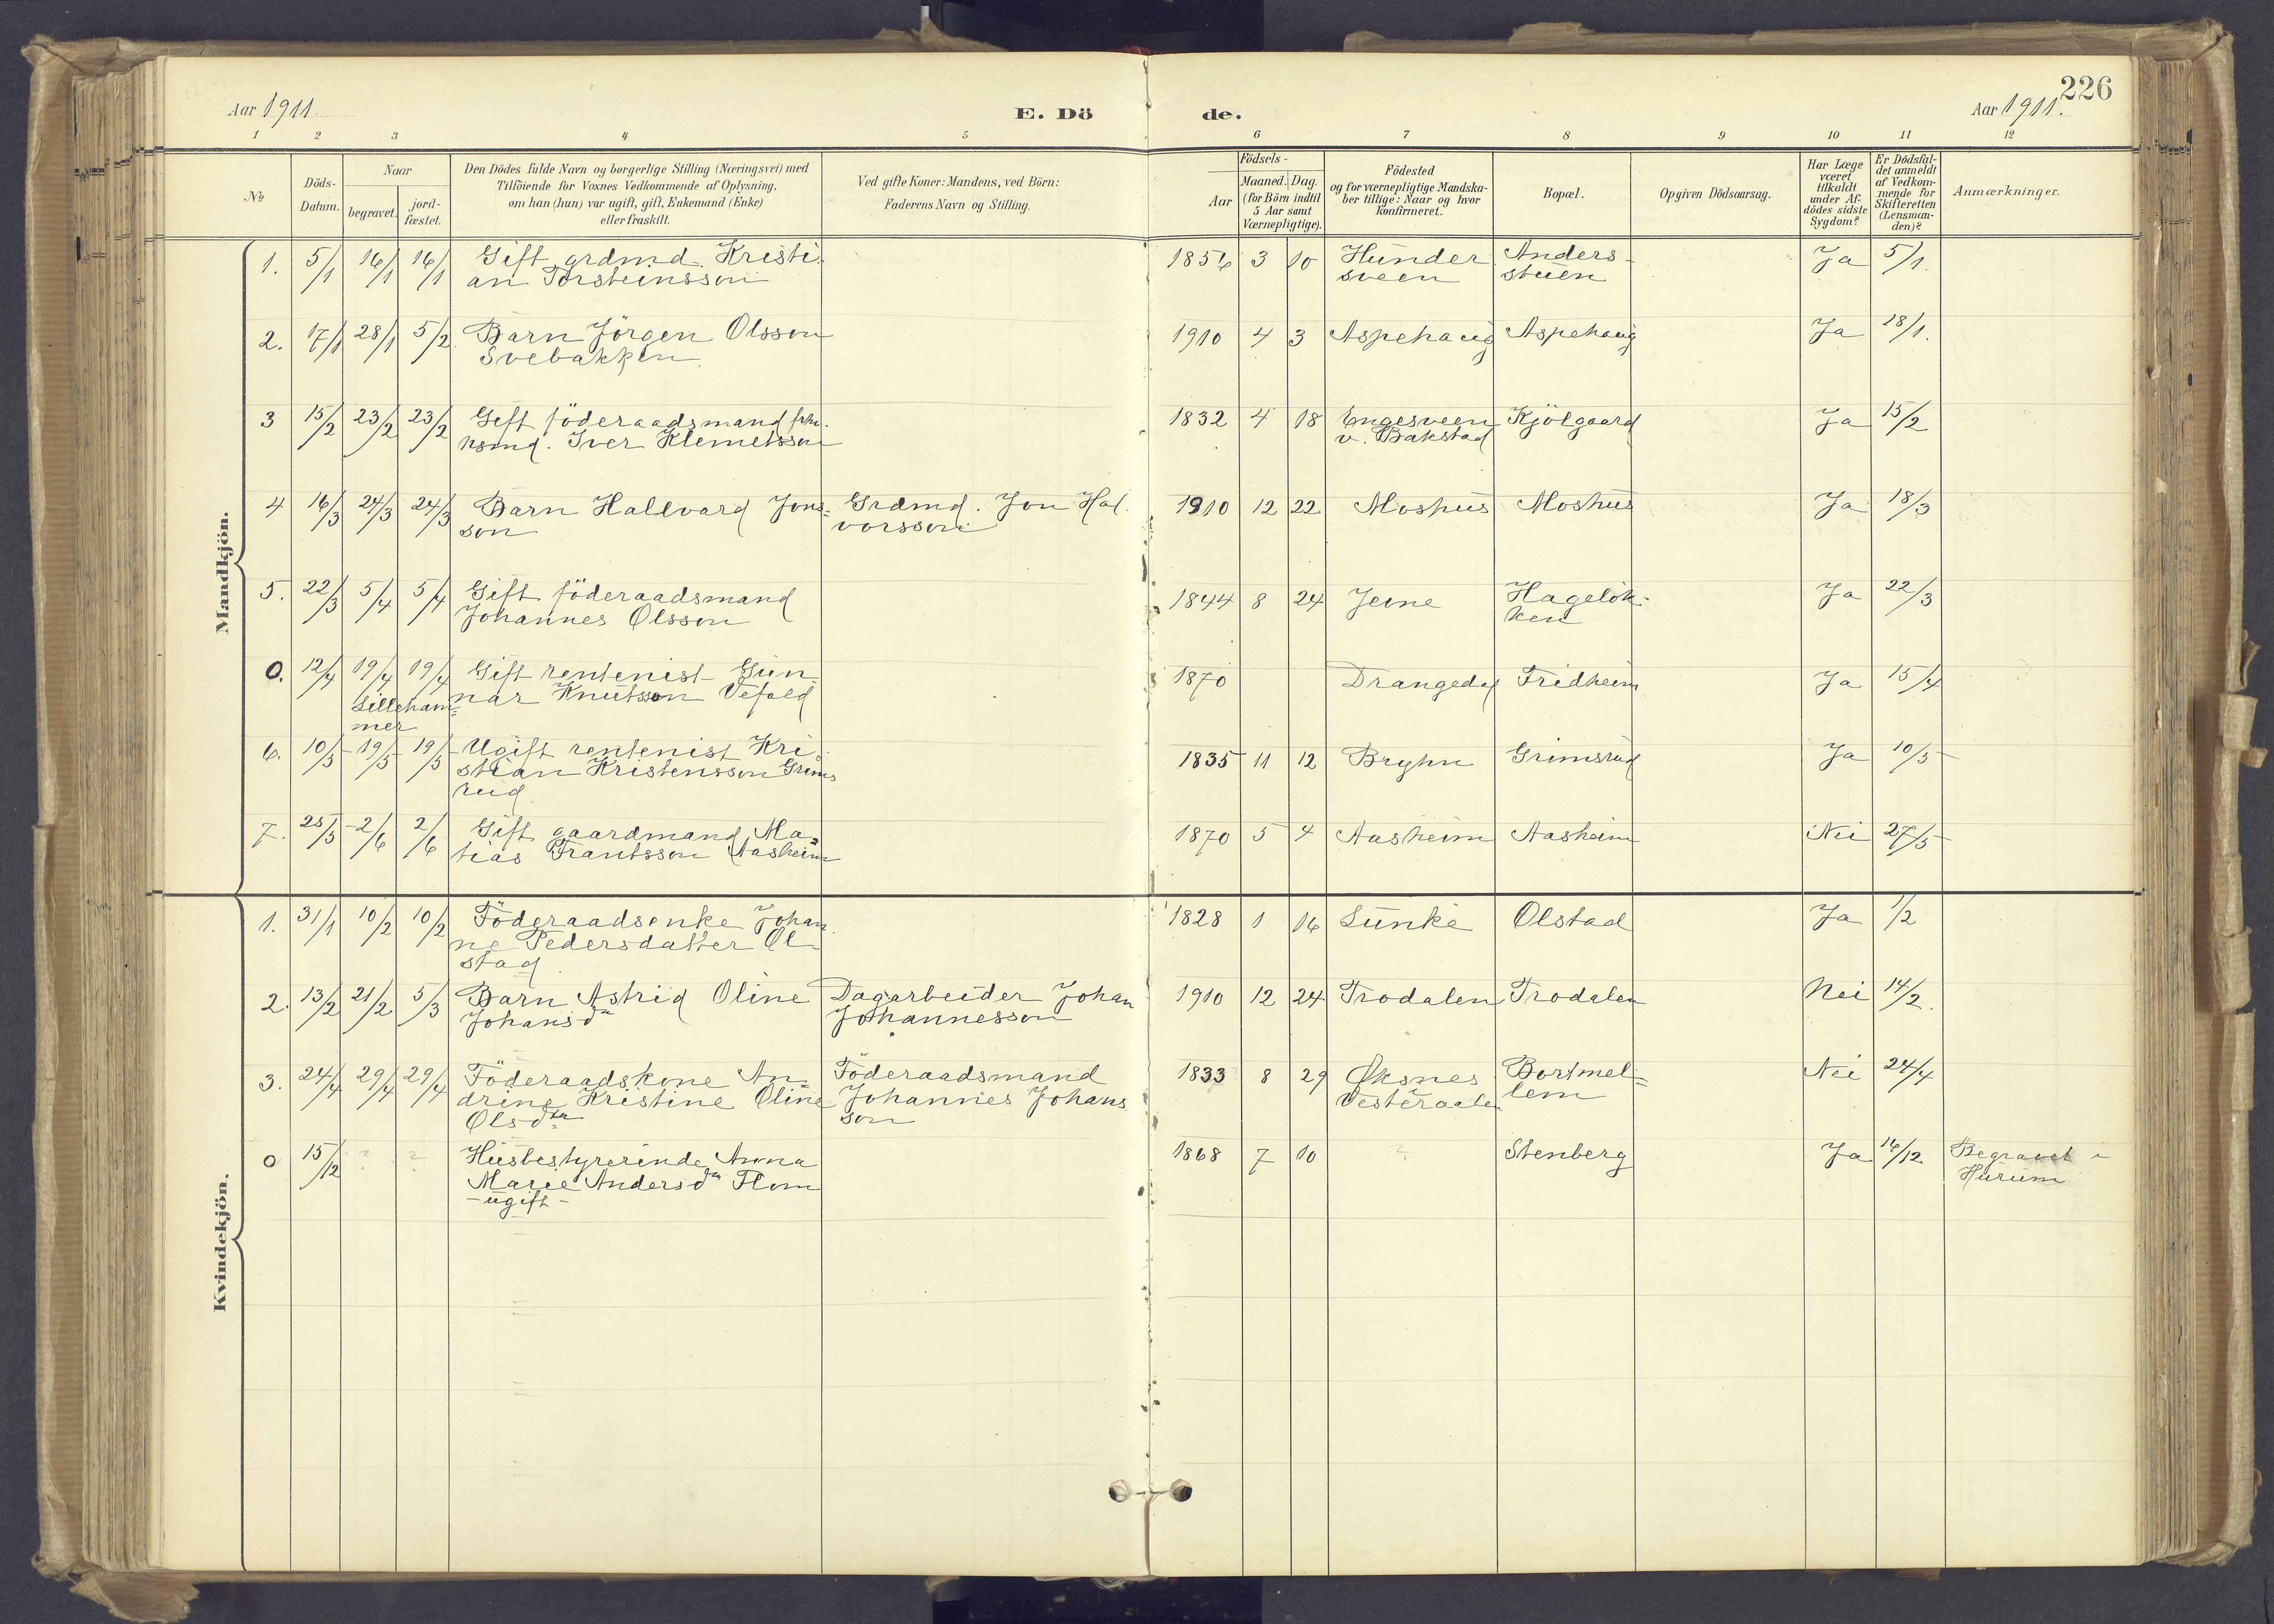 SAH, Øyer prestekontor, Ministerialbok nr. 12, 1897-1920, s. 226